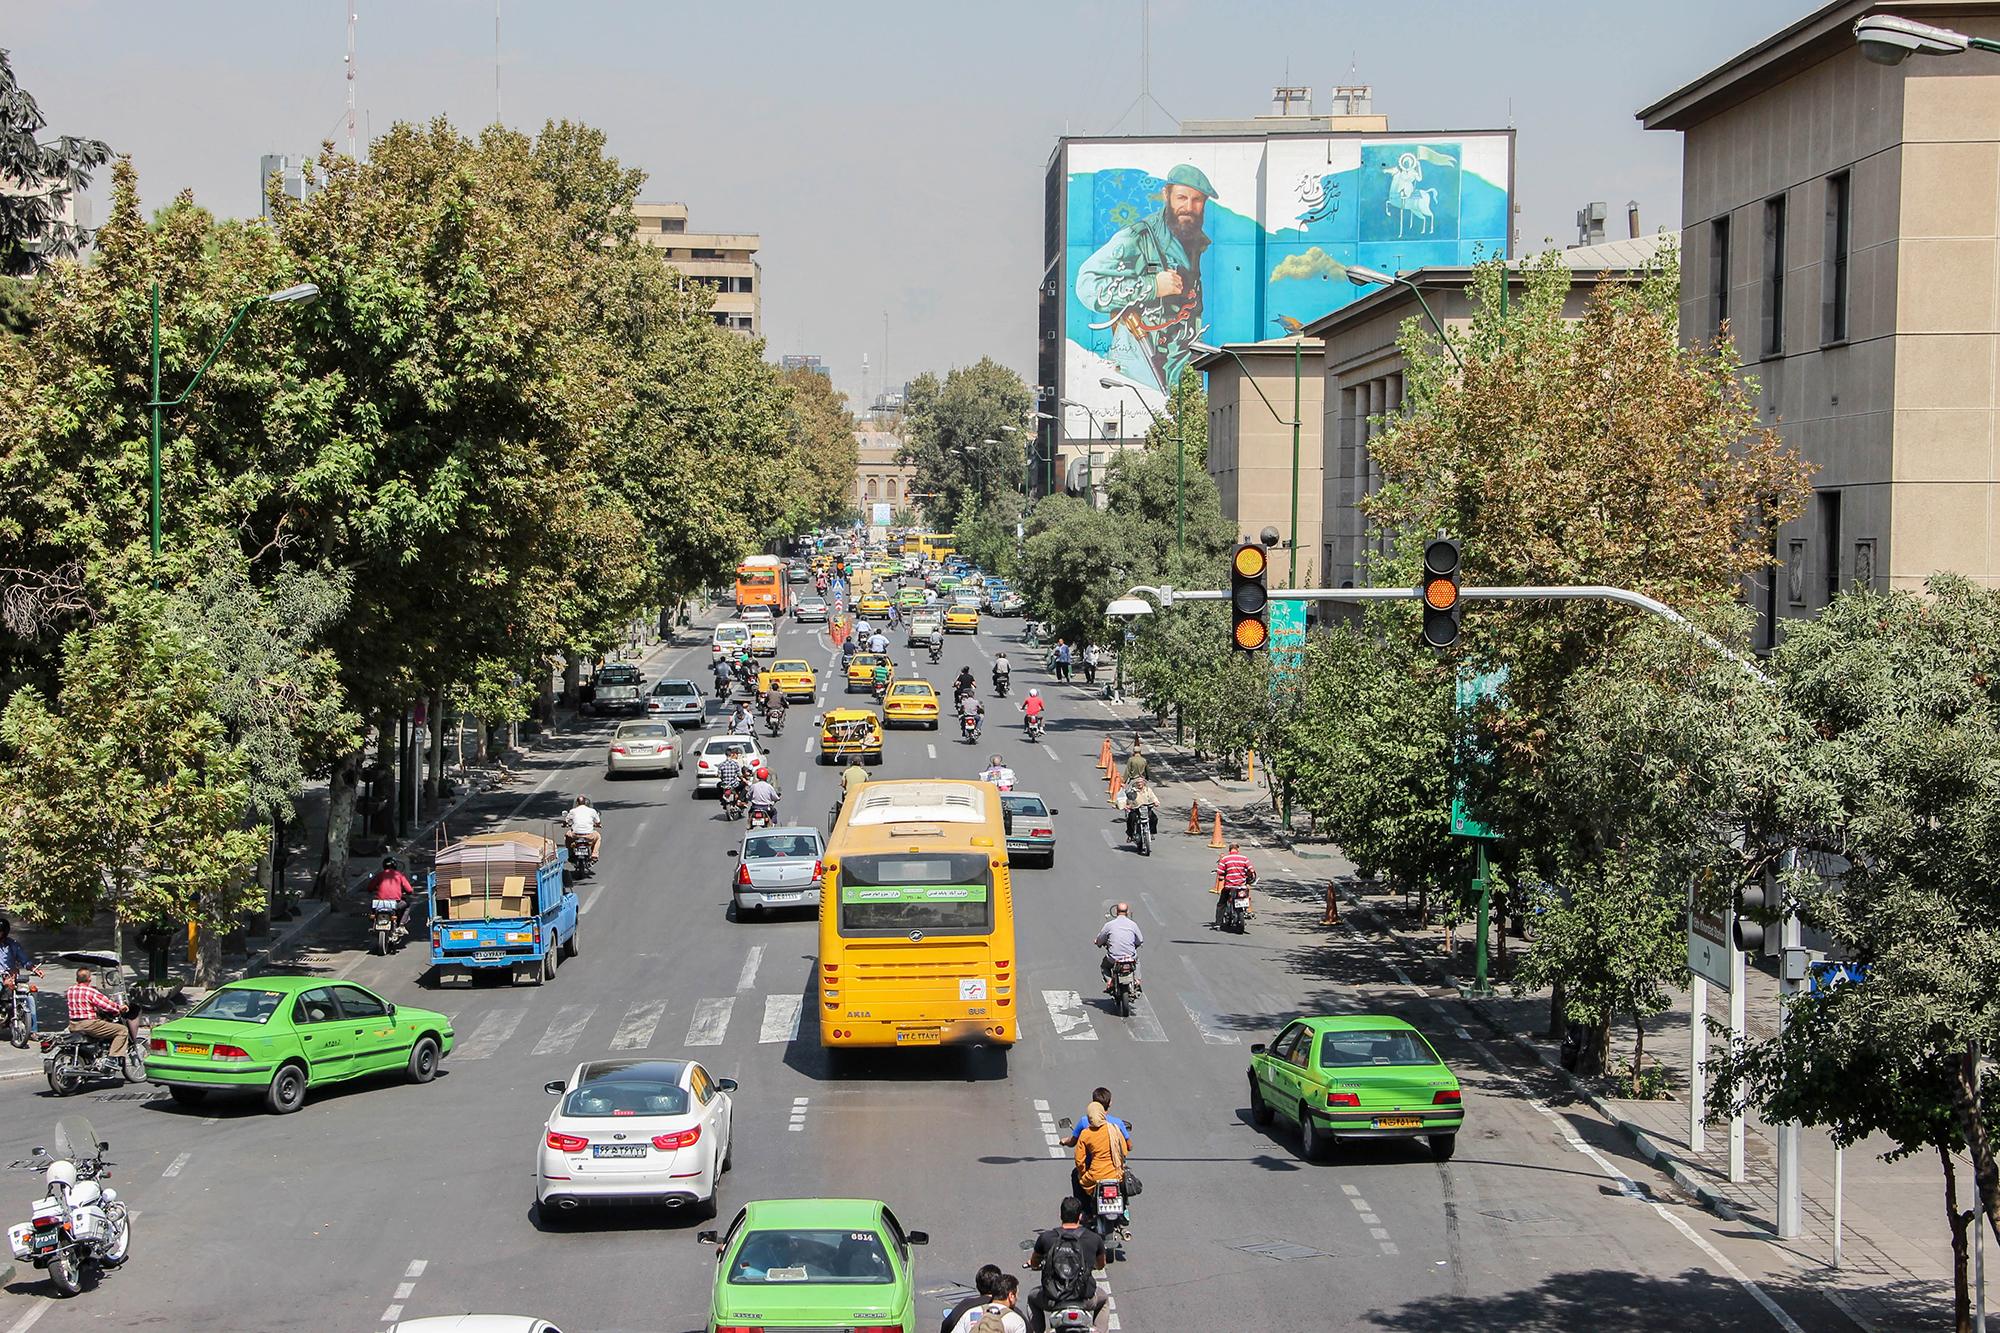 The bustling streets of Tehran. Photo courtesy Becki Enright.